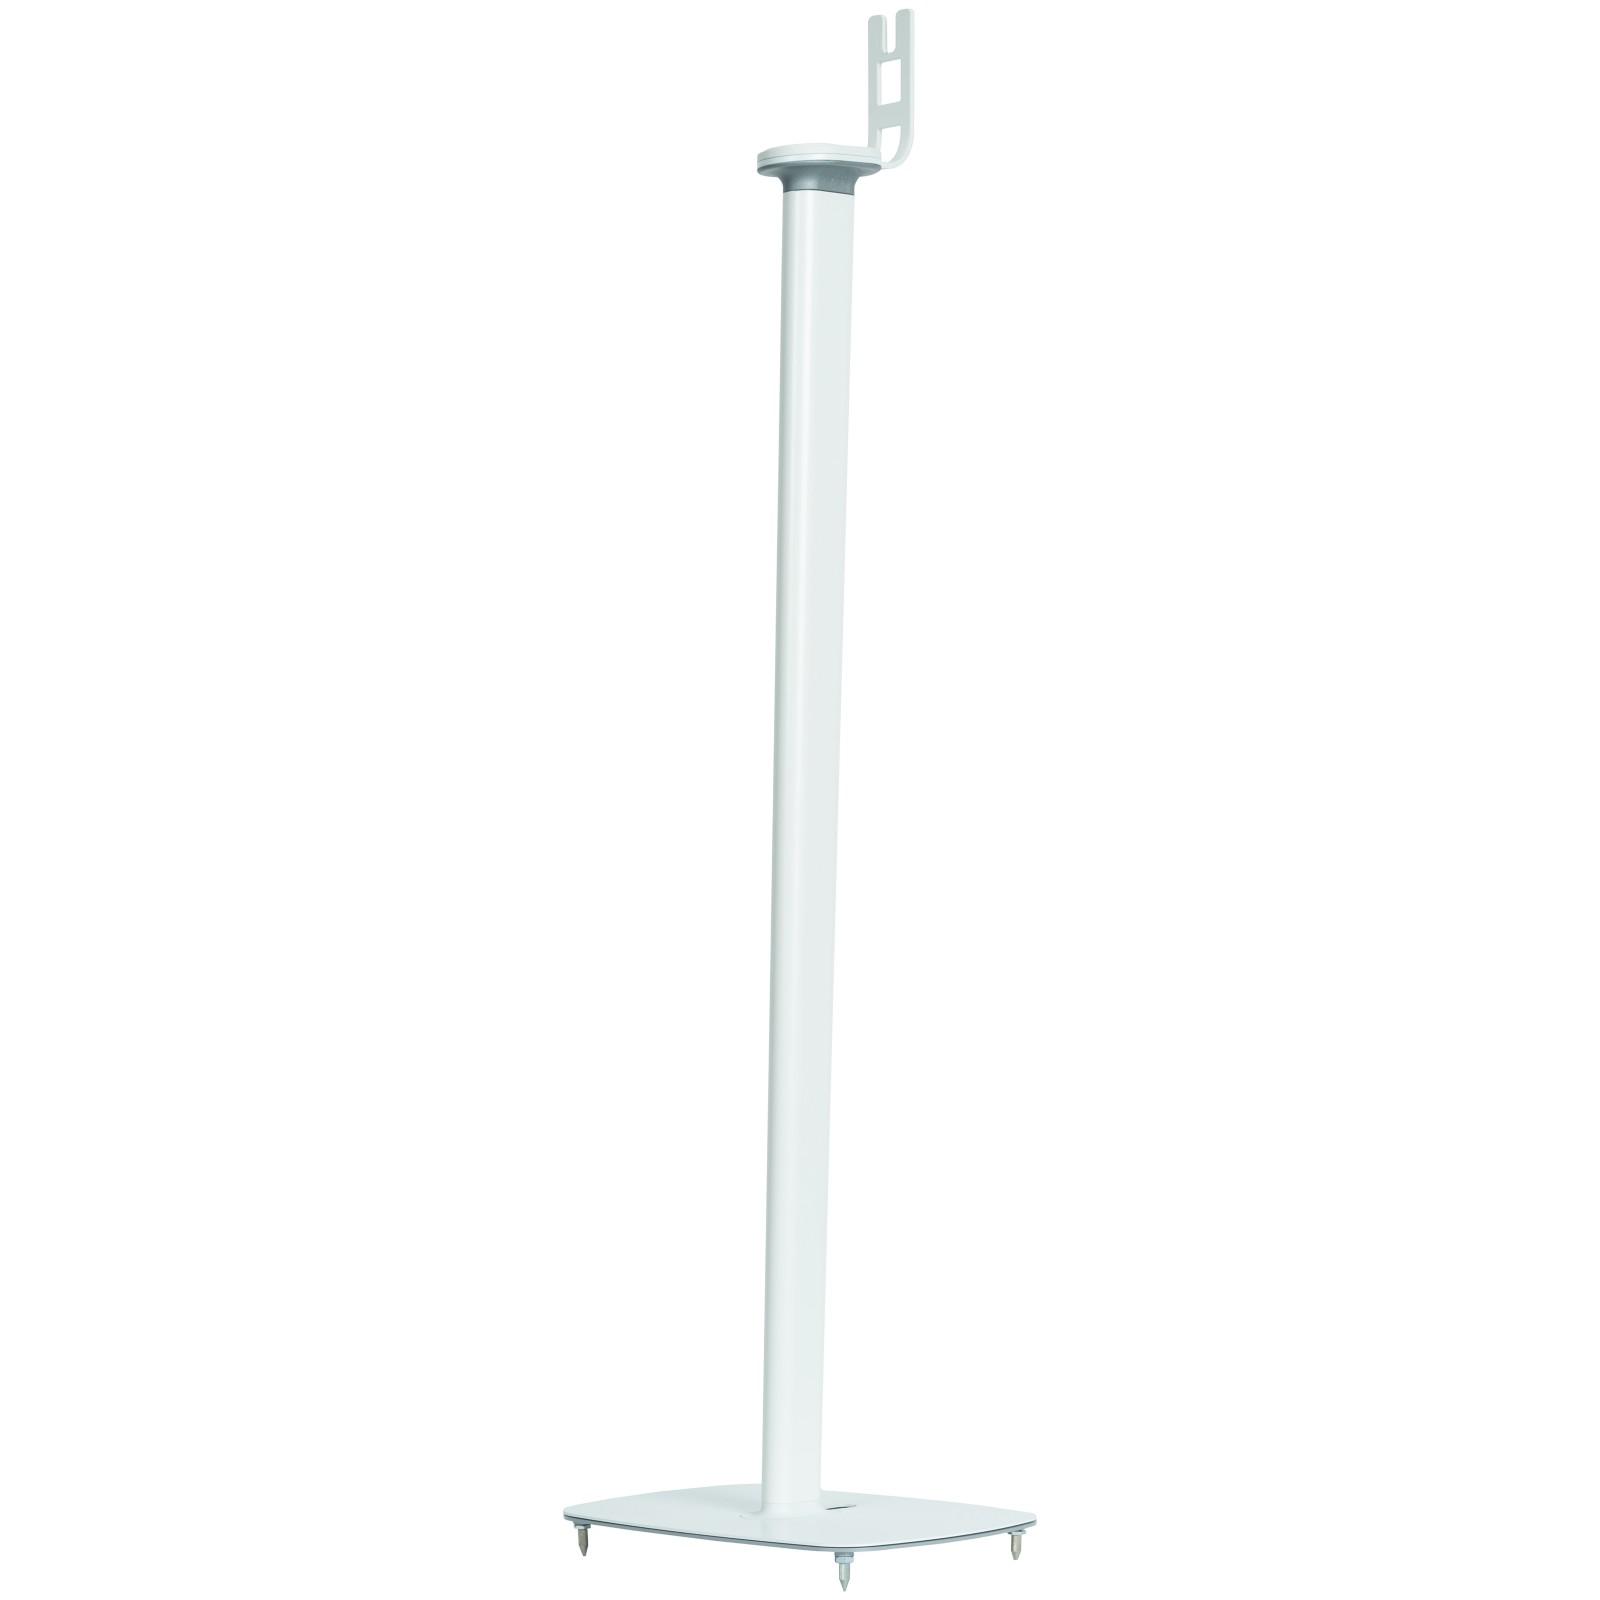 Flexson Sonos PLAY:1 Floor Stand White